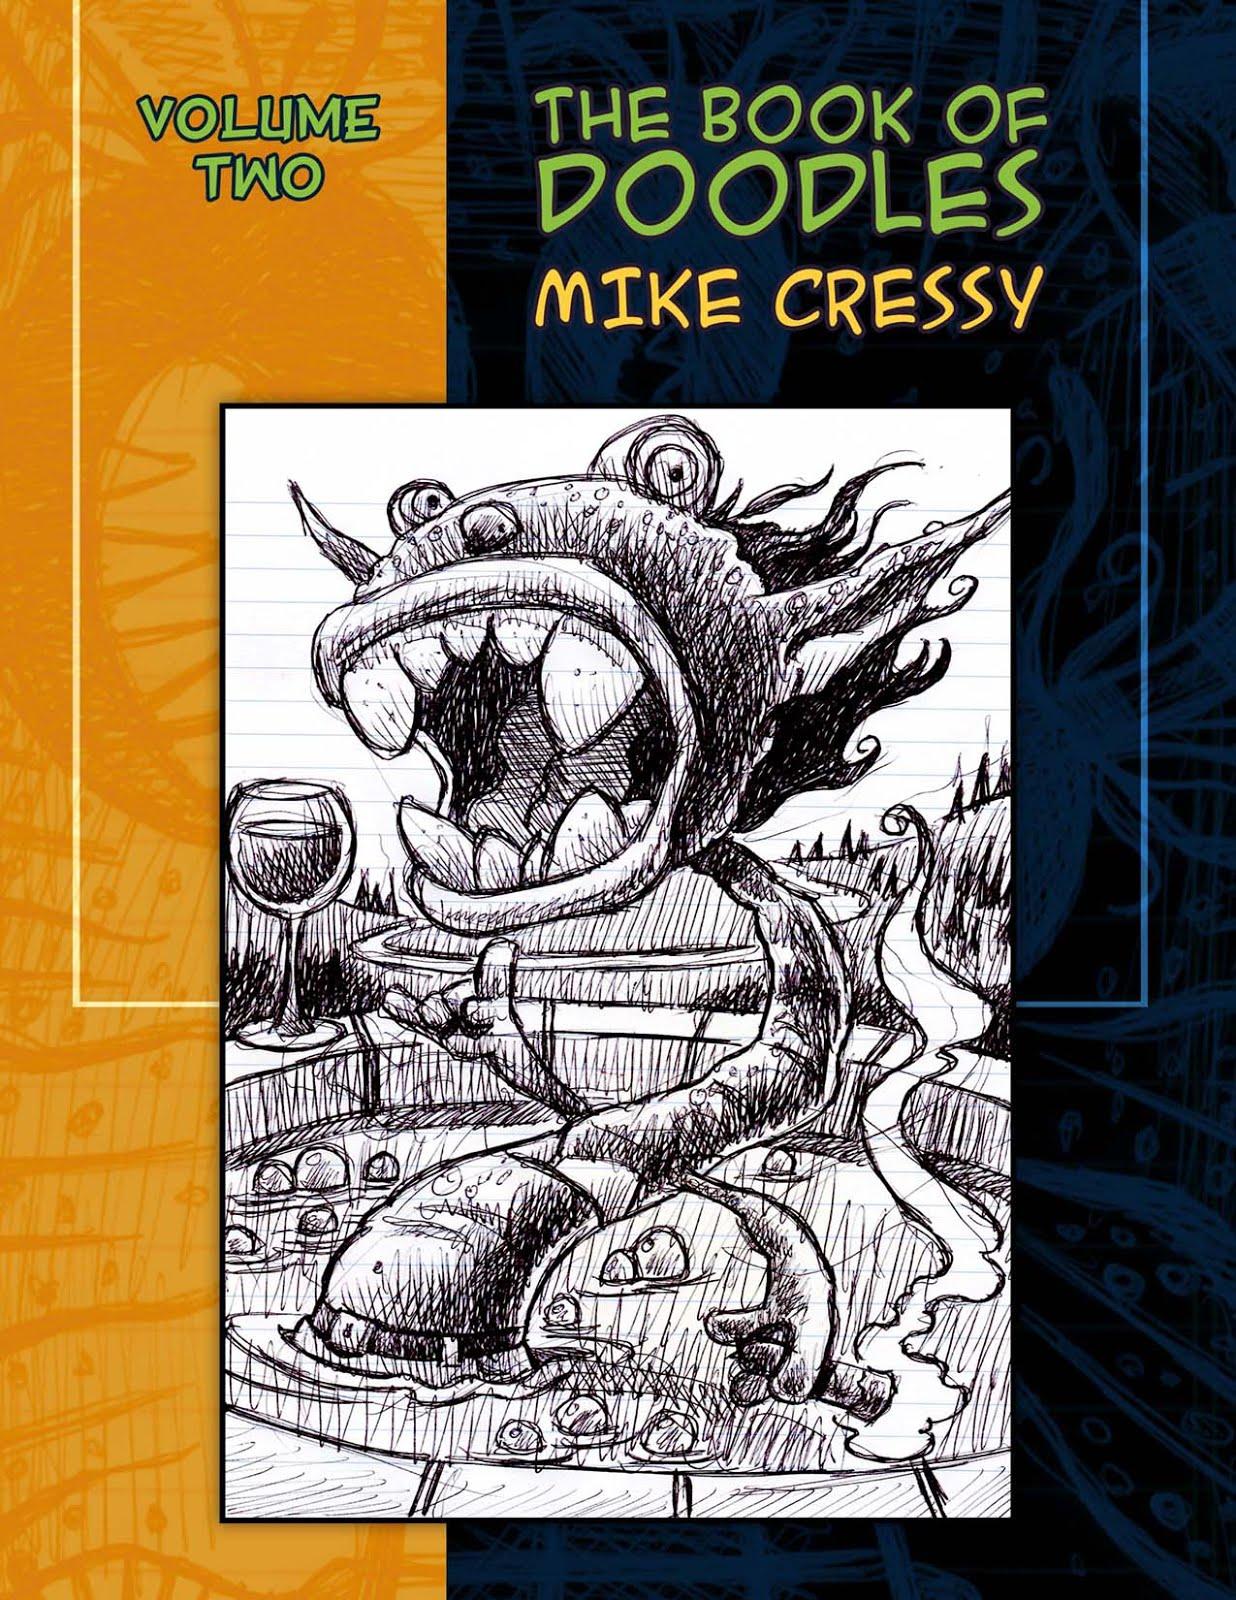 The Book of Doodles Vol 2